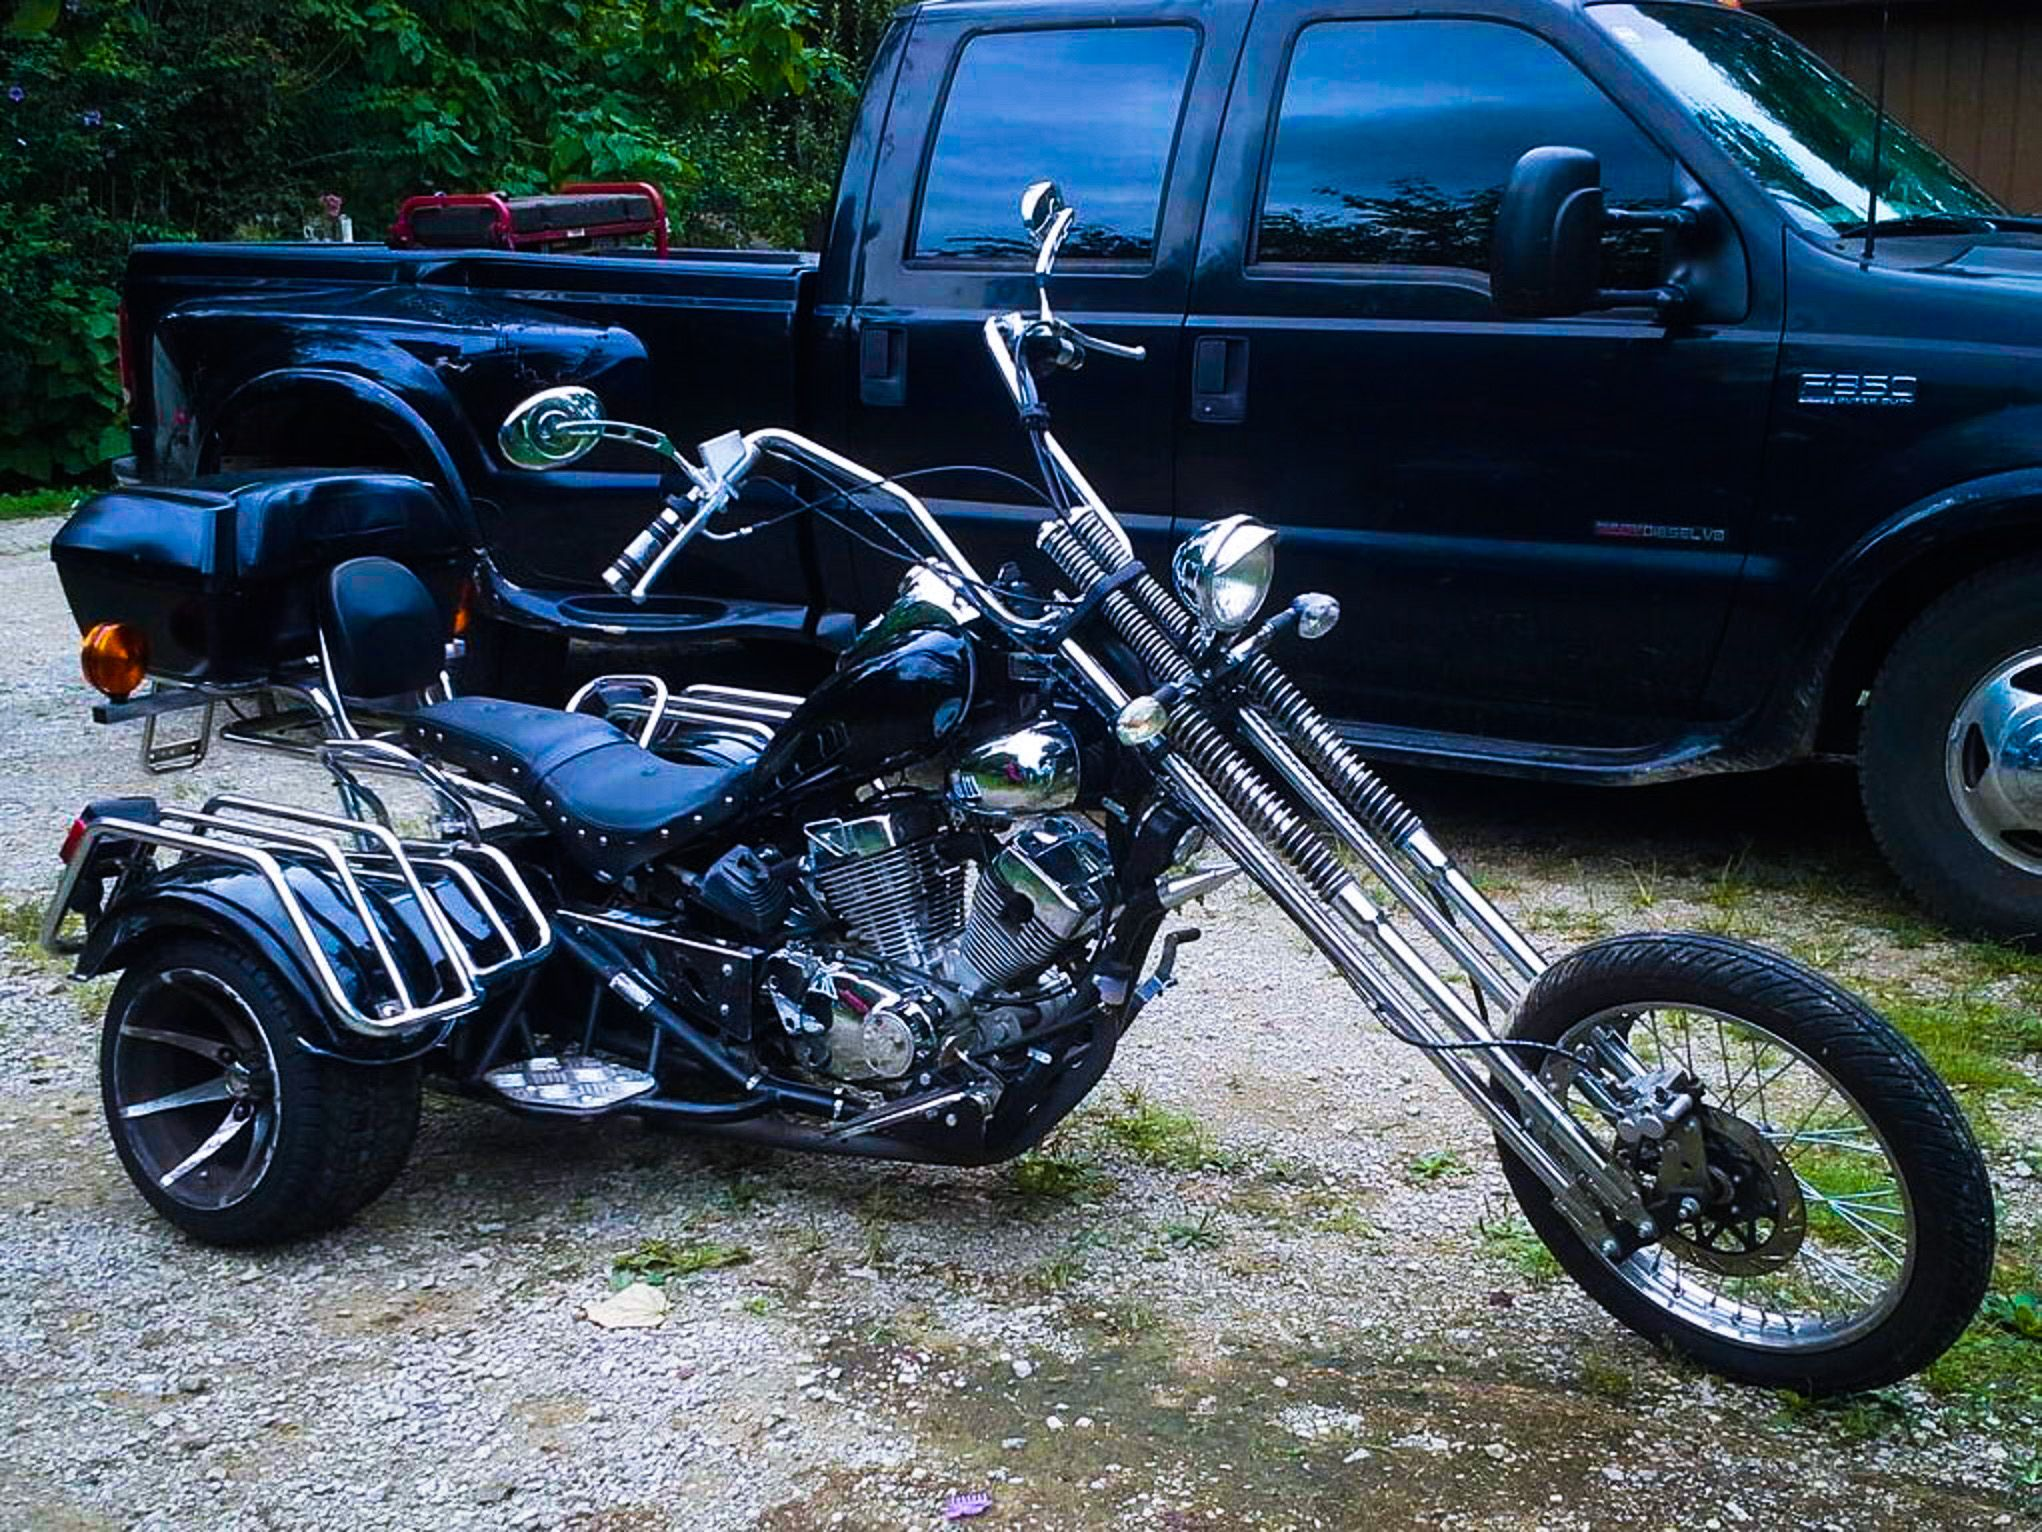 2014 ice bear 250cc road warrior trike 3 500 or best offer http [ 2042 x 1532 Pixel ]